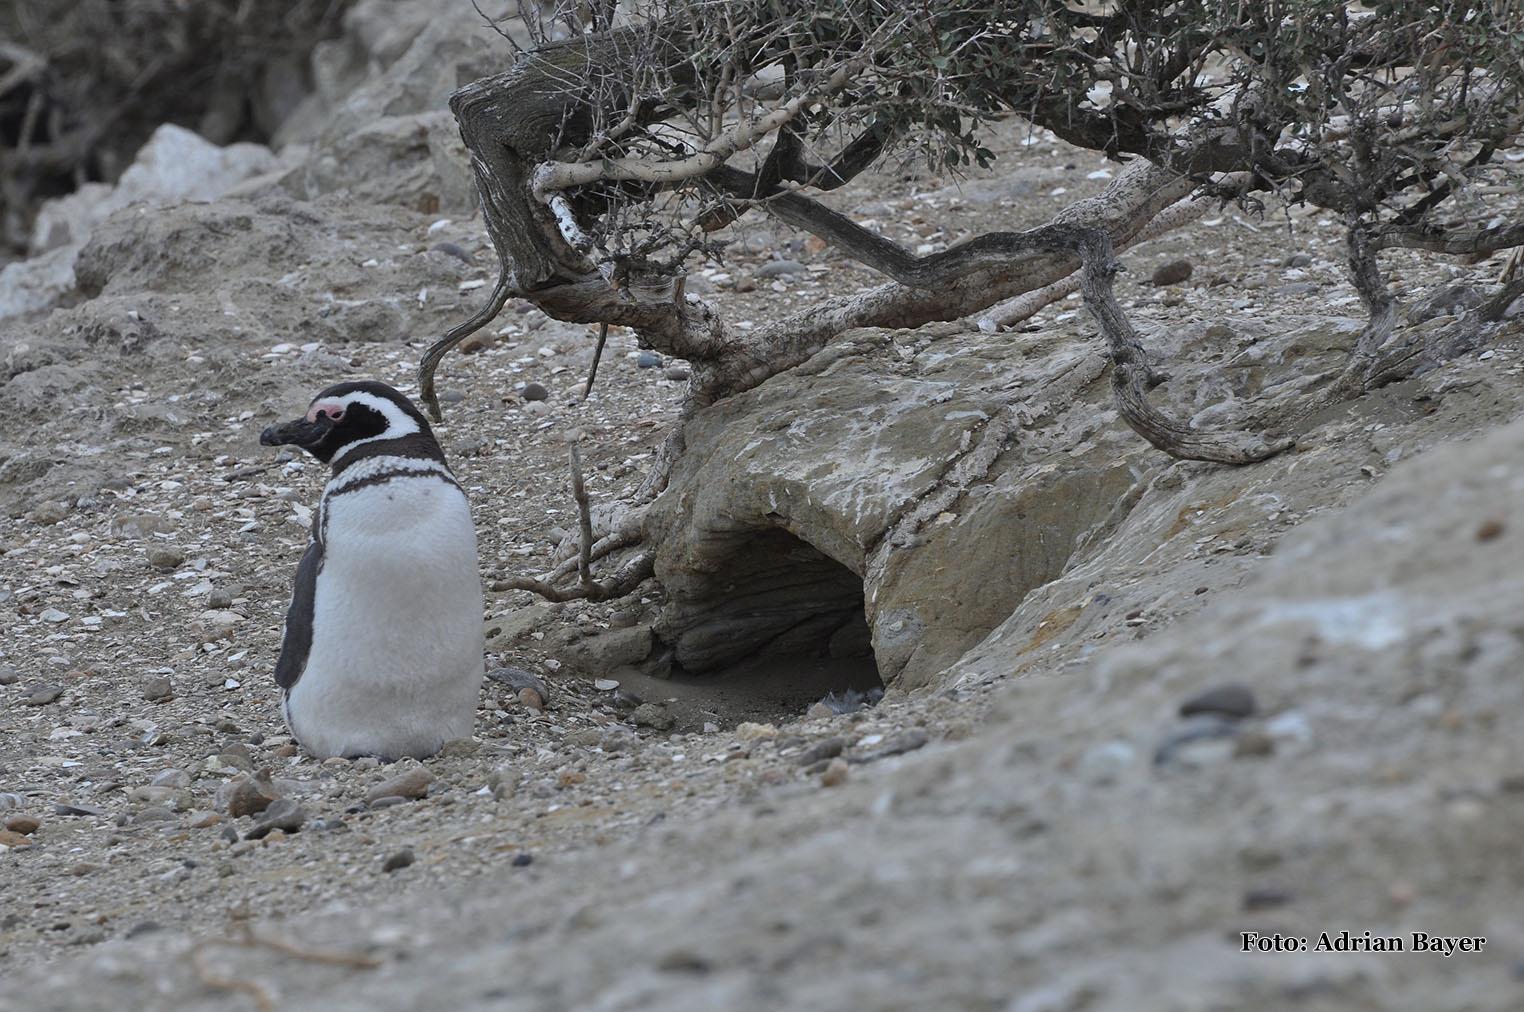 Parque Nacional Monte León-Pinguin de Magalhãesr